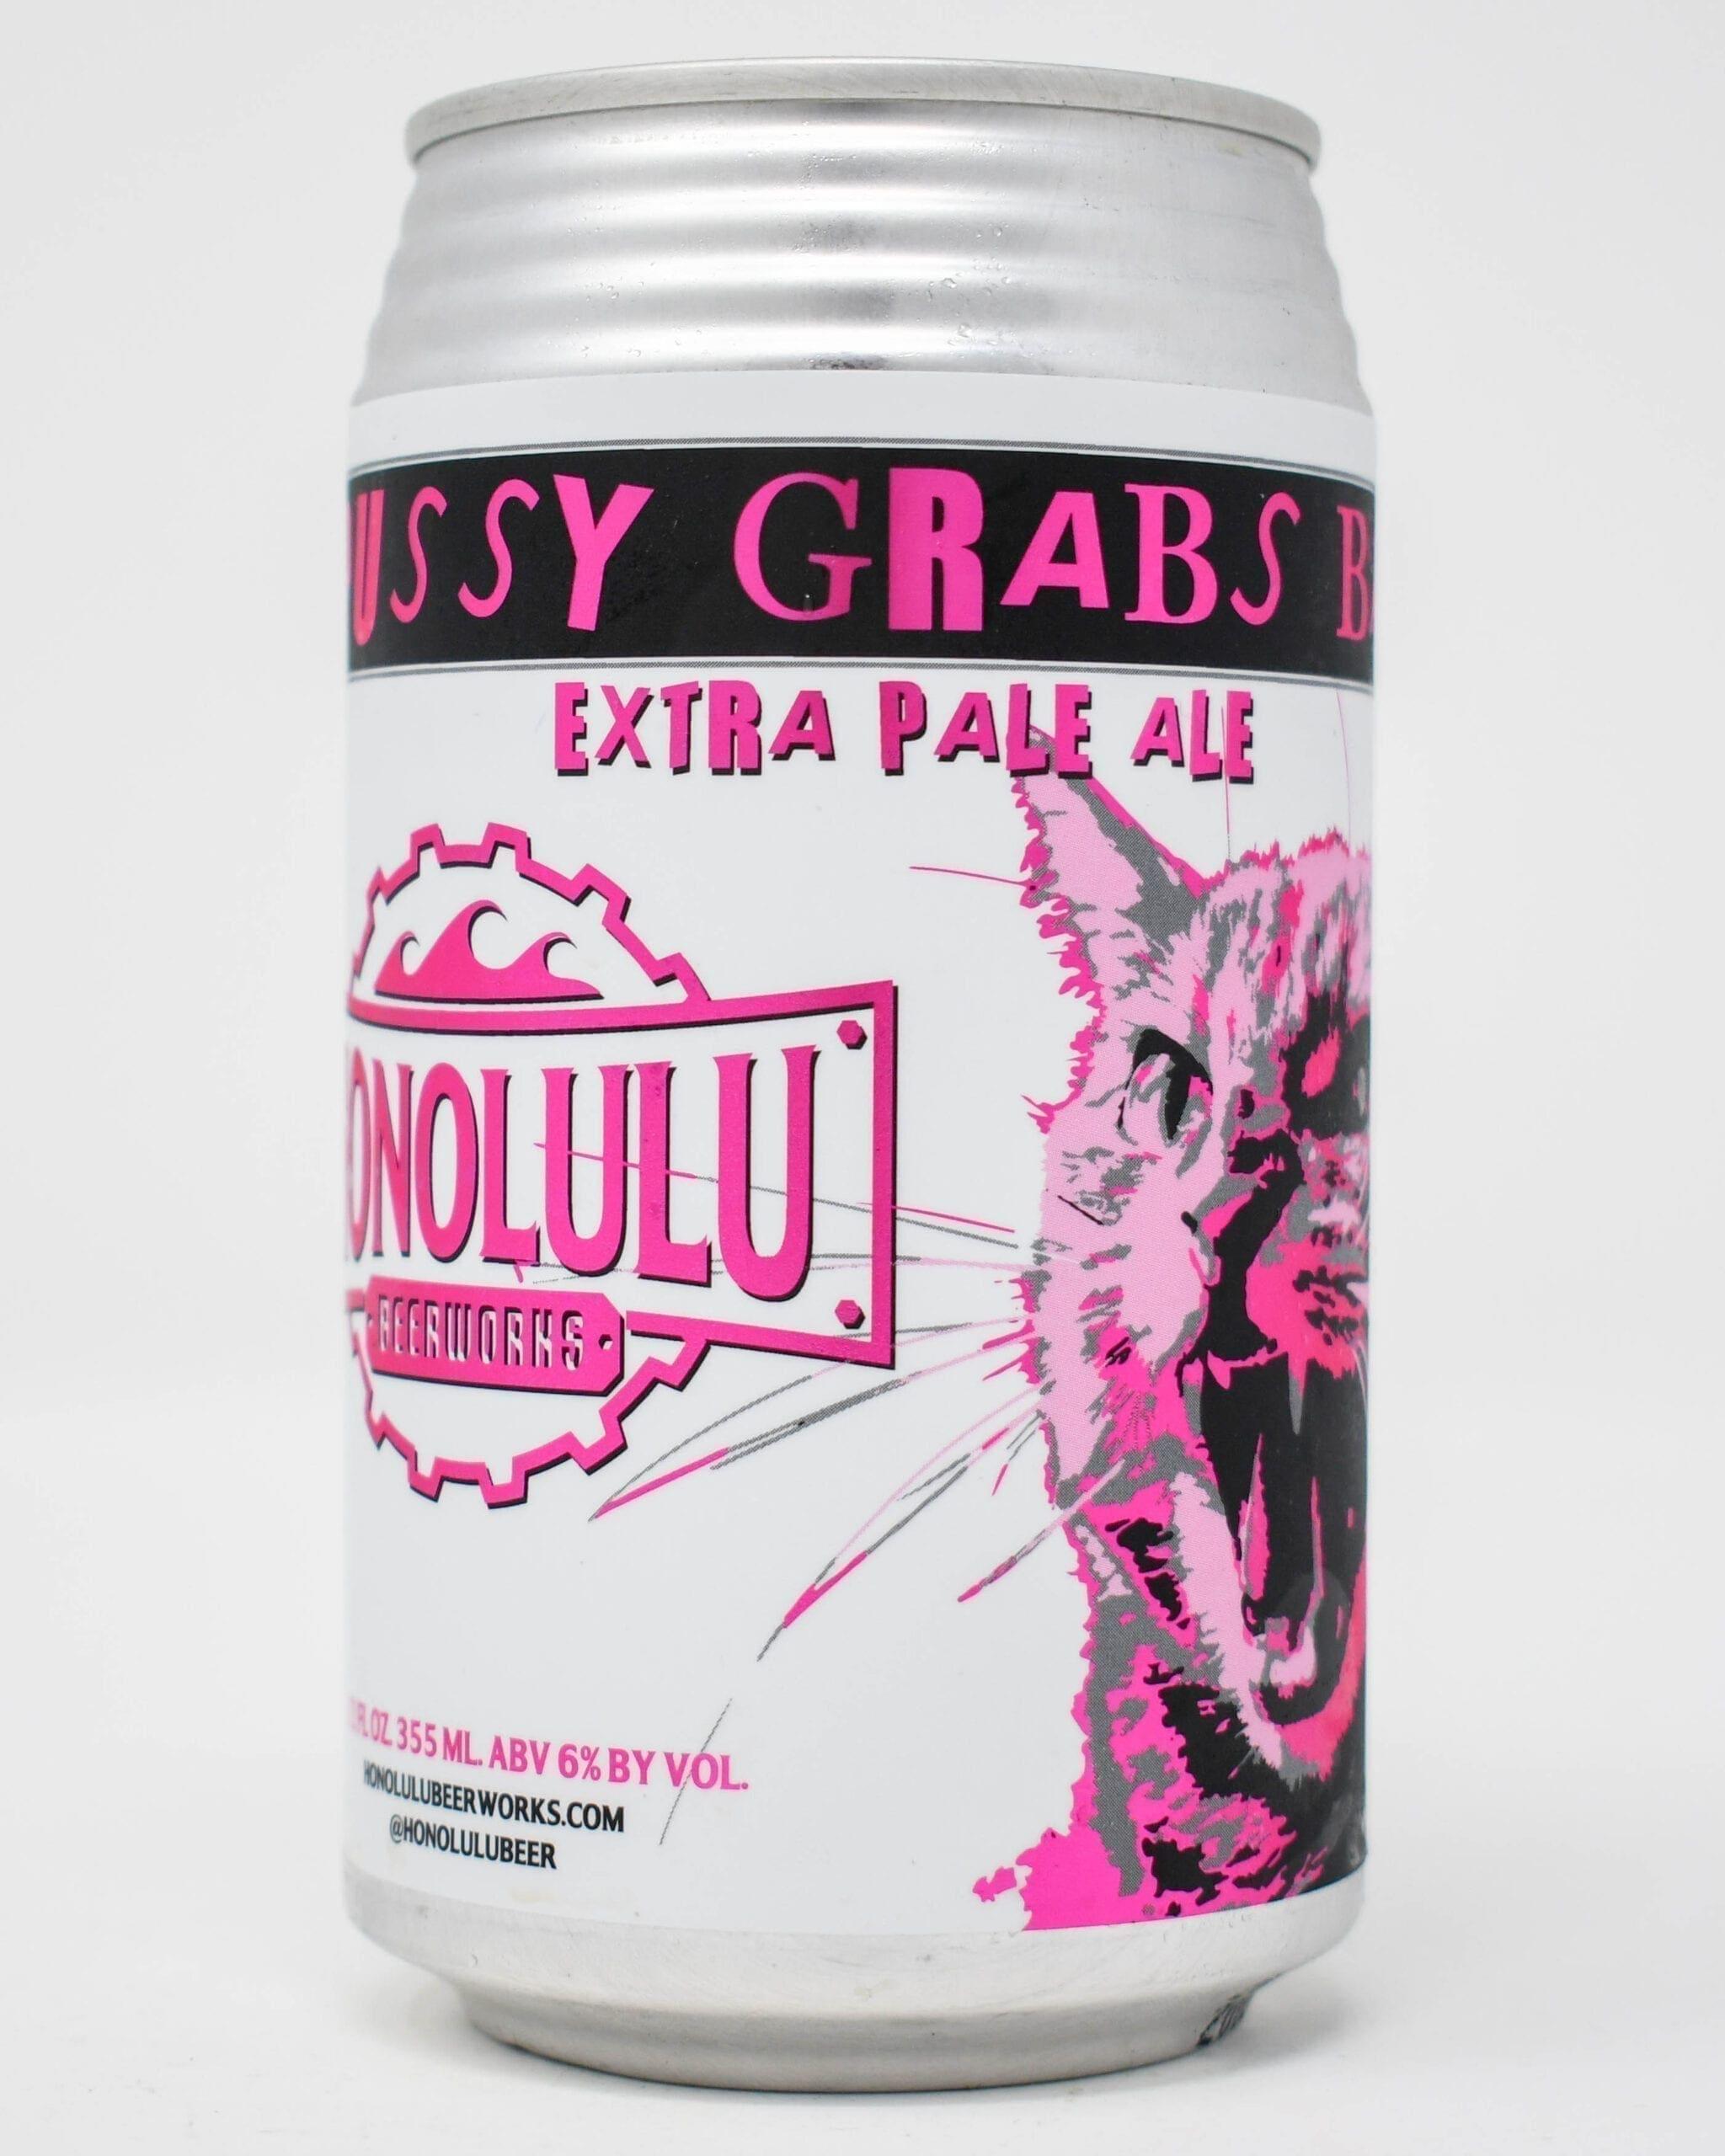 Honolulu Beerworks, Pussy Grabs Back, Extra Pale Ale